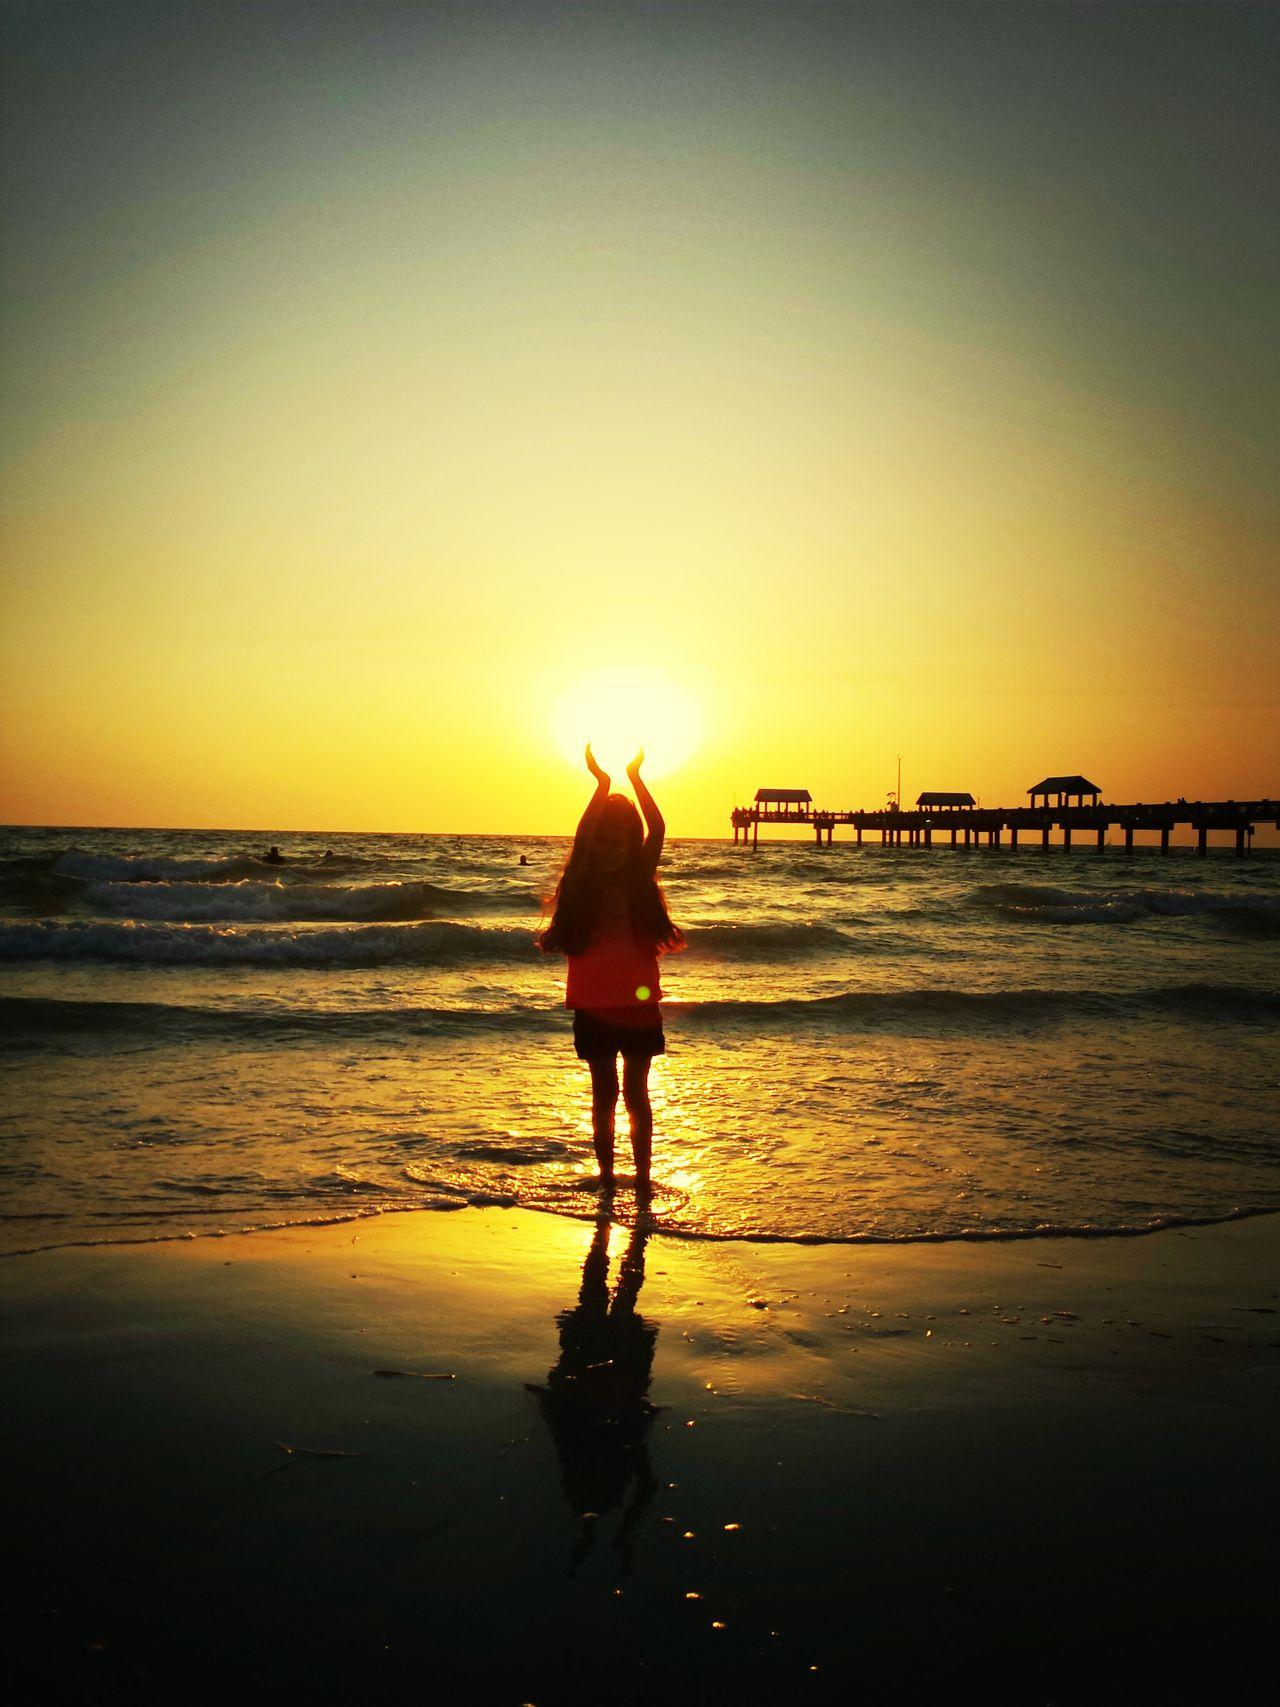 Sunset Pure Energy Enjoy The Outdoors Golden Power